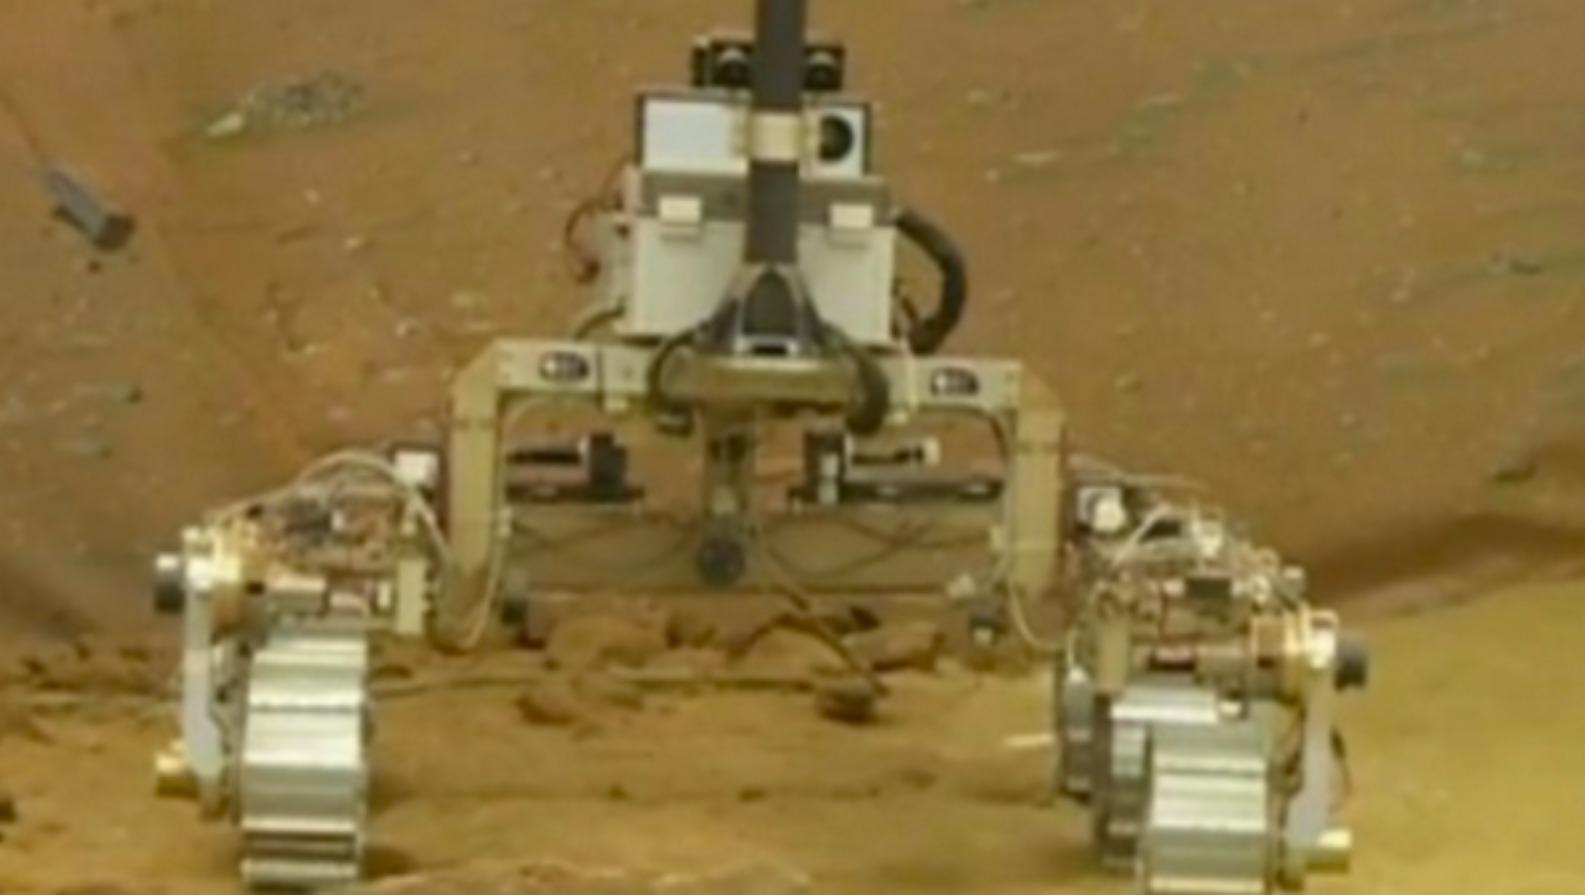 ground control astronaut - photo #25